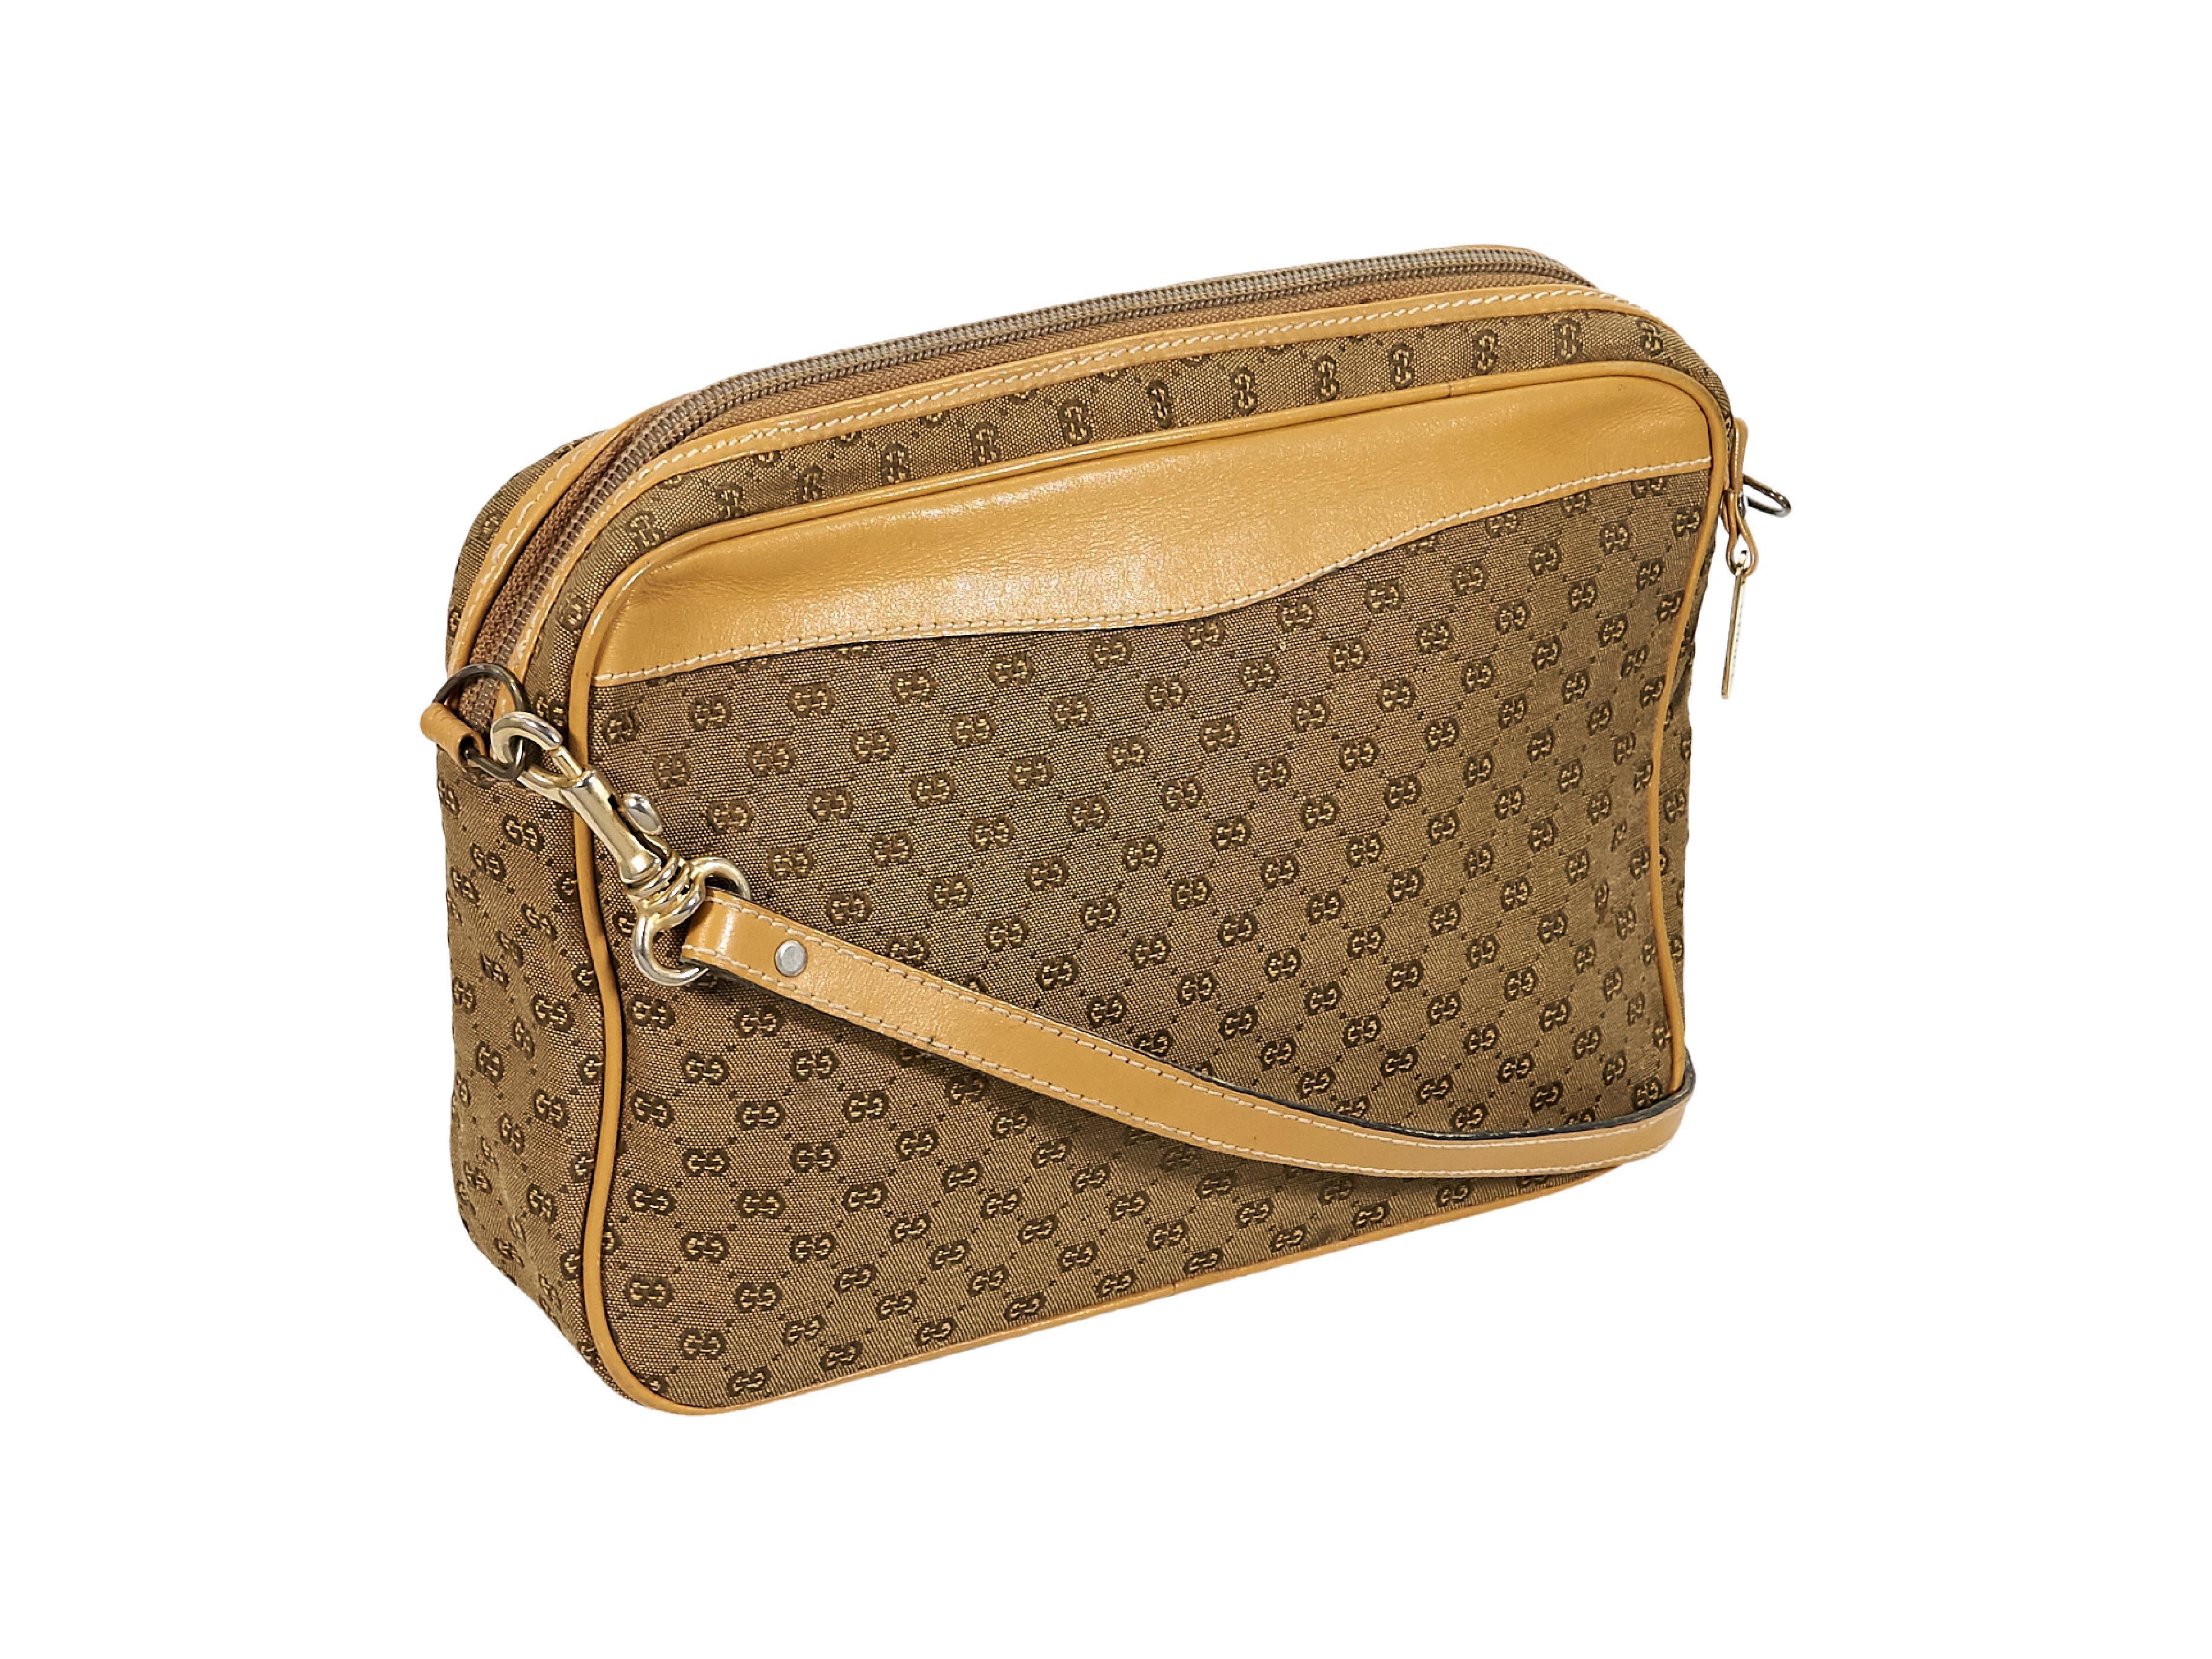 f9c32475a09 Tan Vintage Gucci Logo Crossbody Bag For Sale at 1stdibs